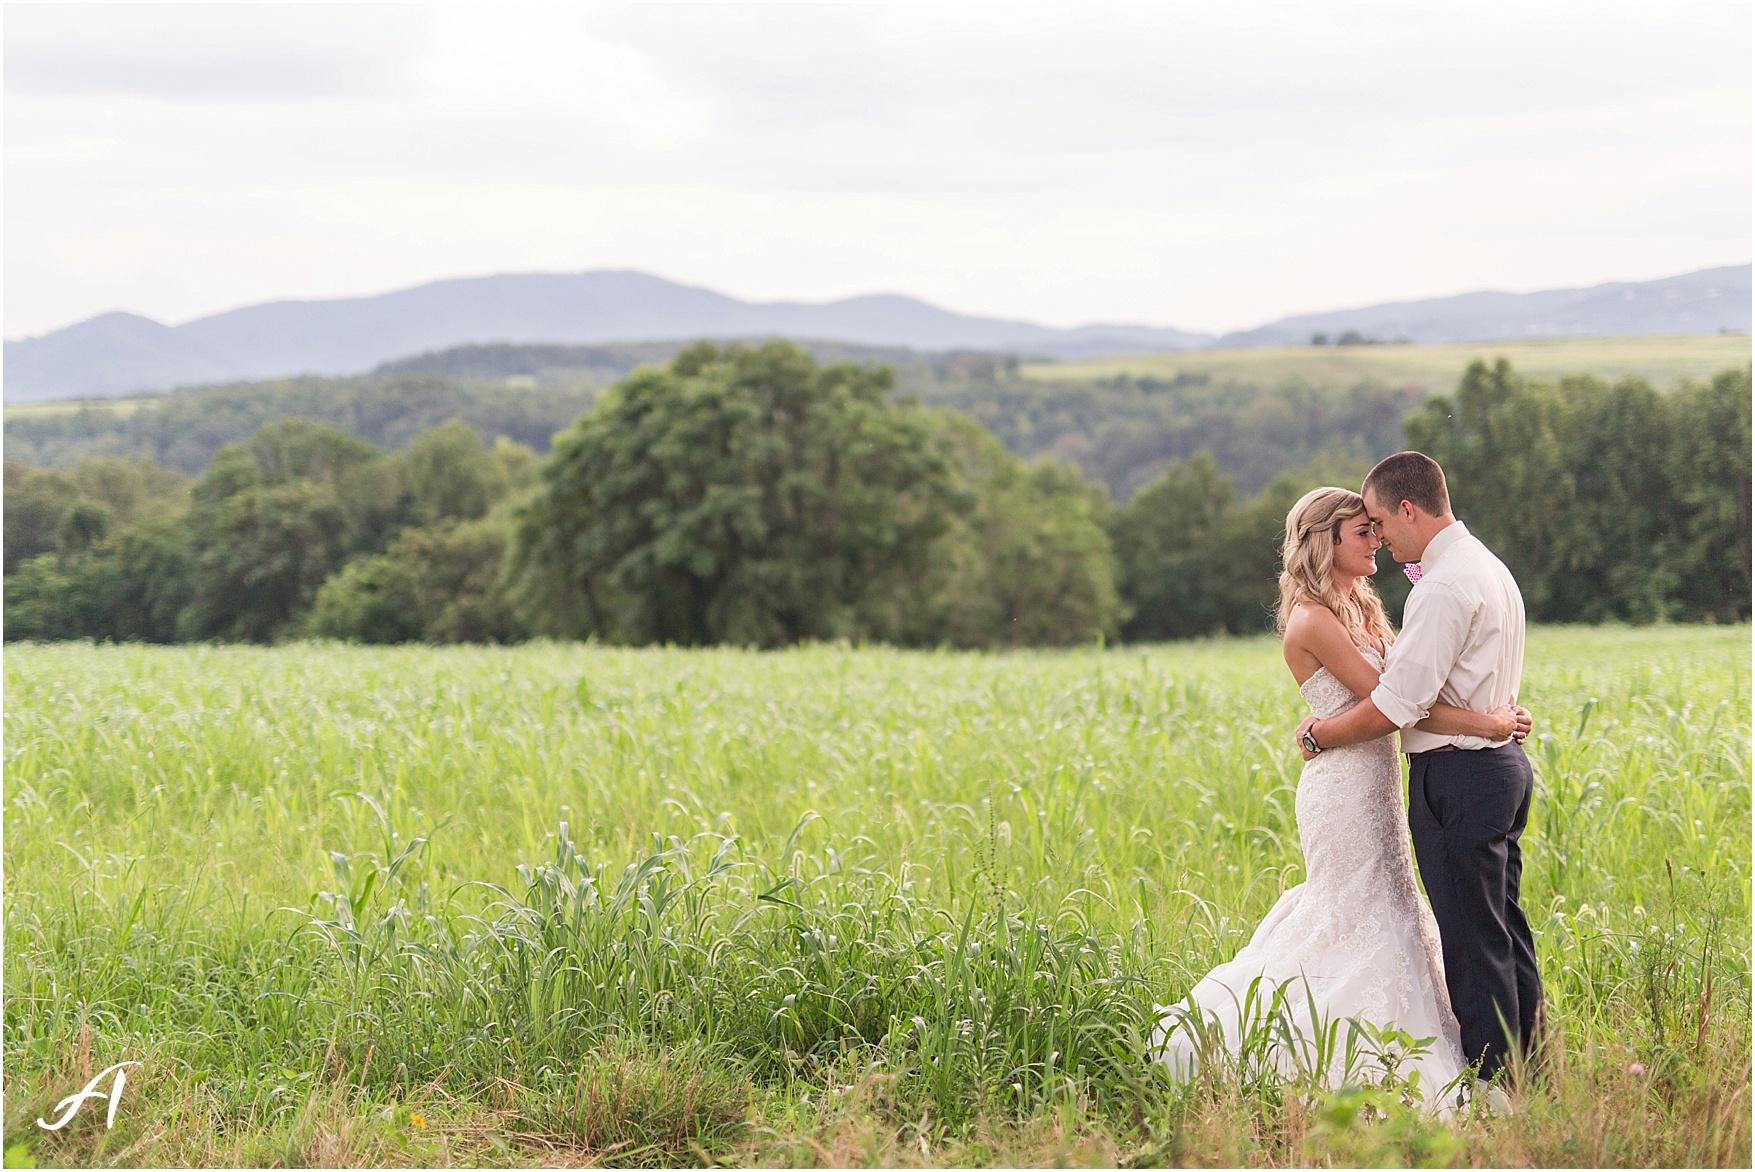 Central Virginia Wedding || Vinton, VA Wedding Photographer  || Ashley Eiban Photography || www.ashleyeiban.com